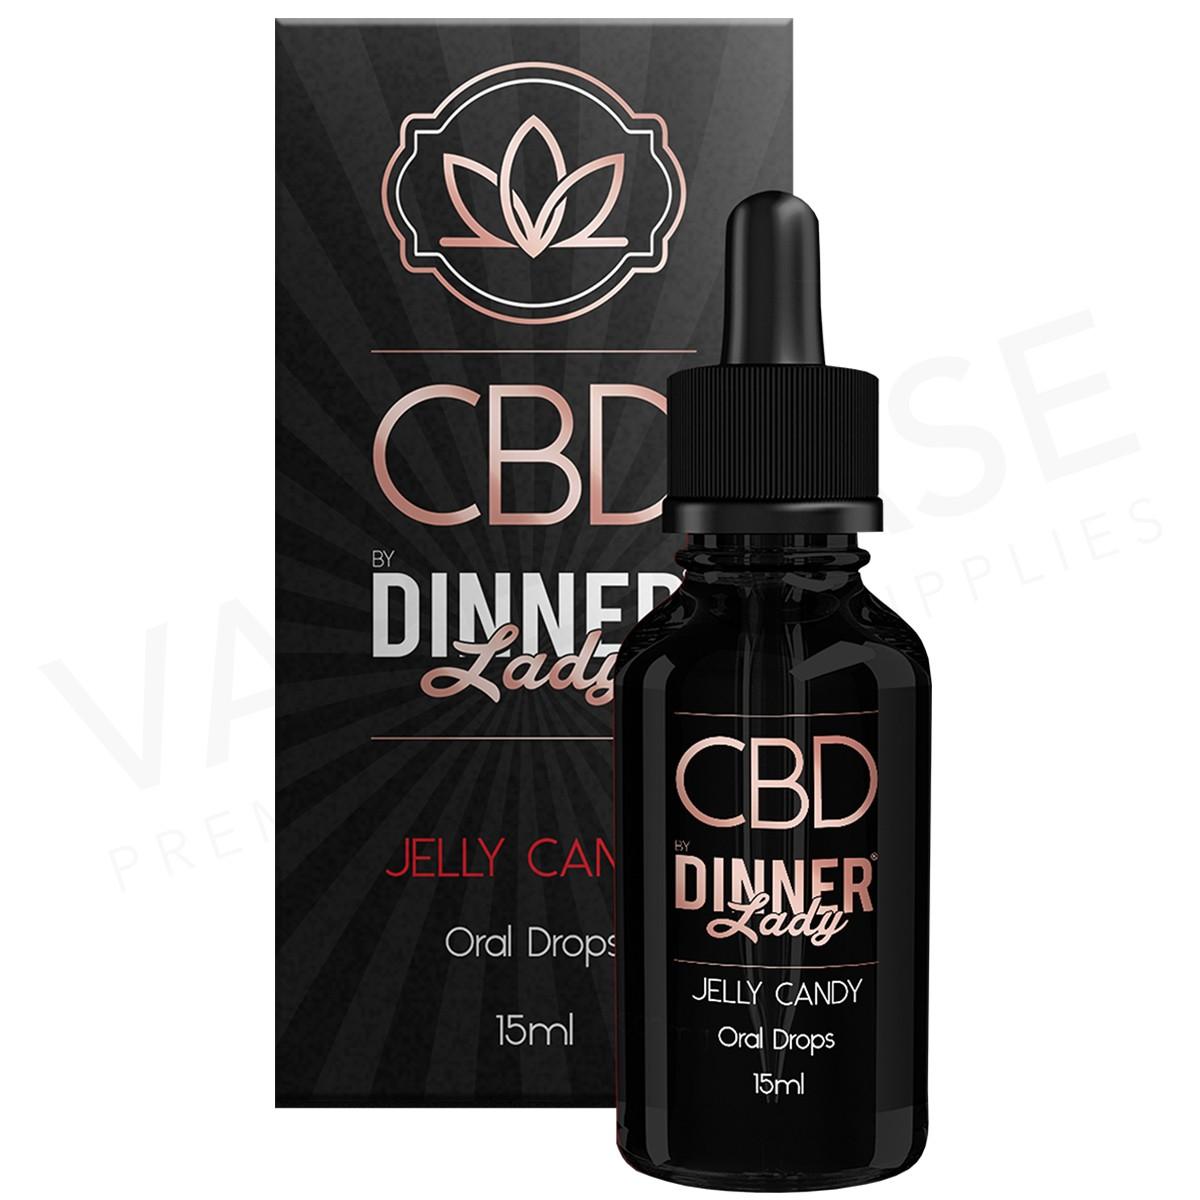 DINNER LADY - CBD DROPS JELLY CANDY (250mg)